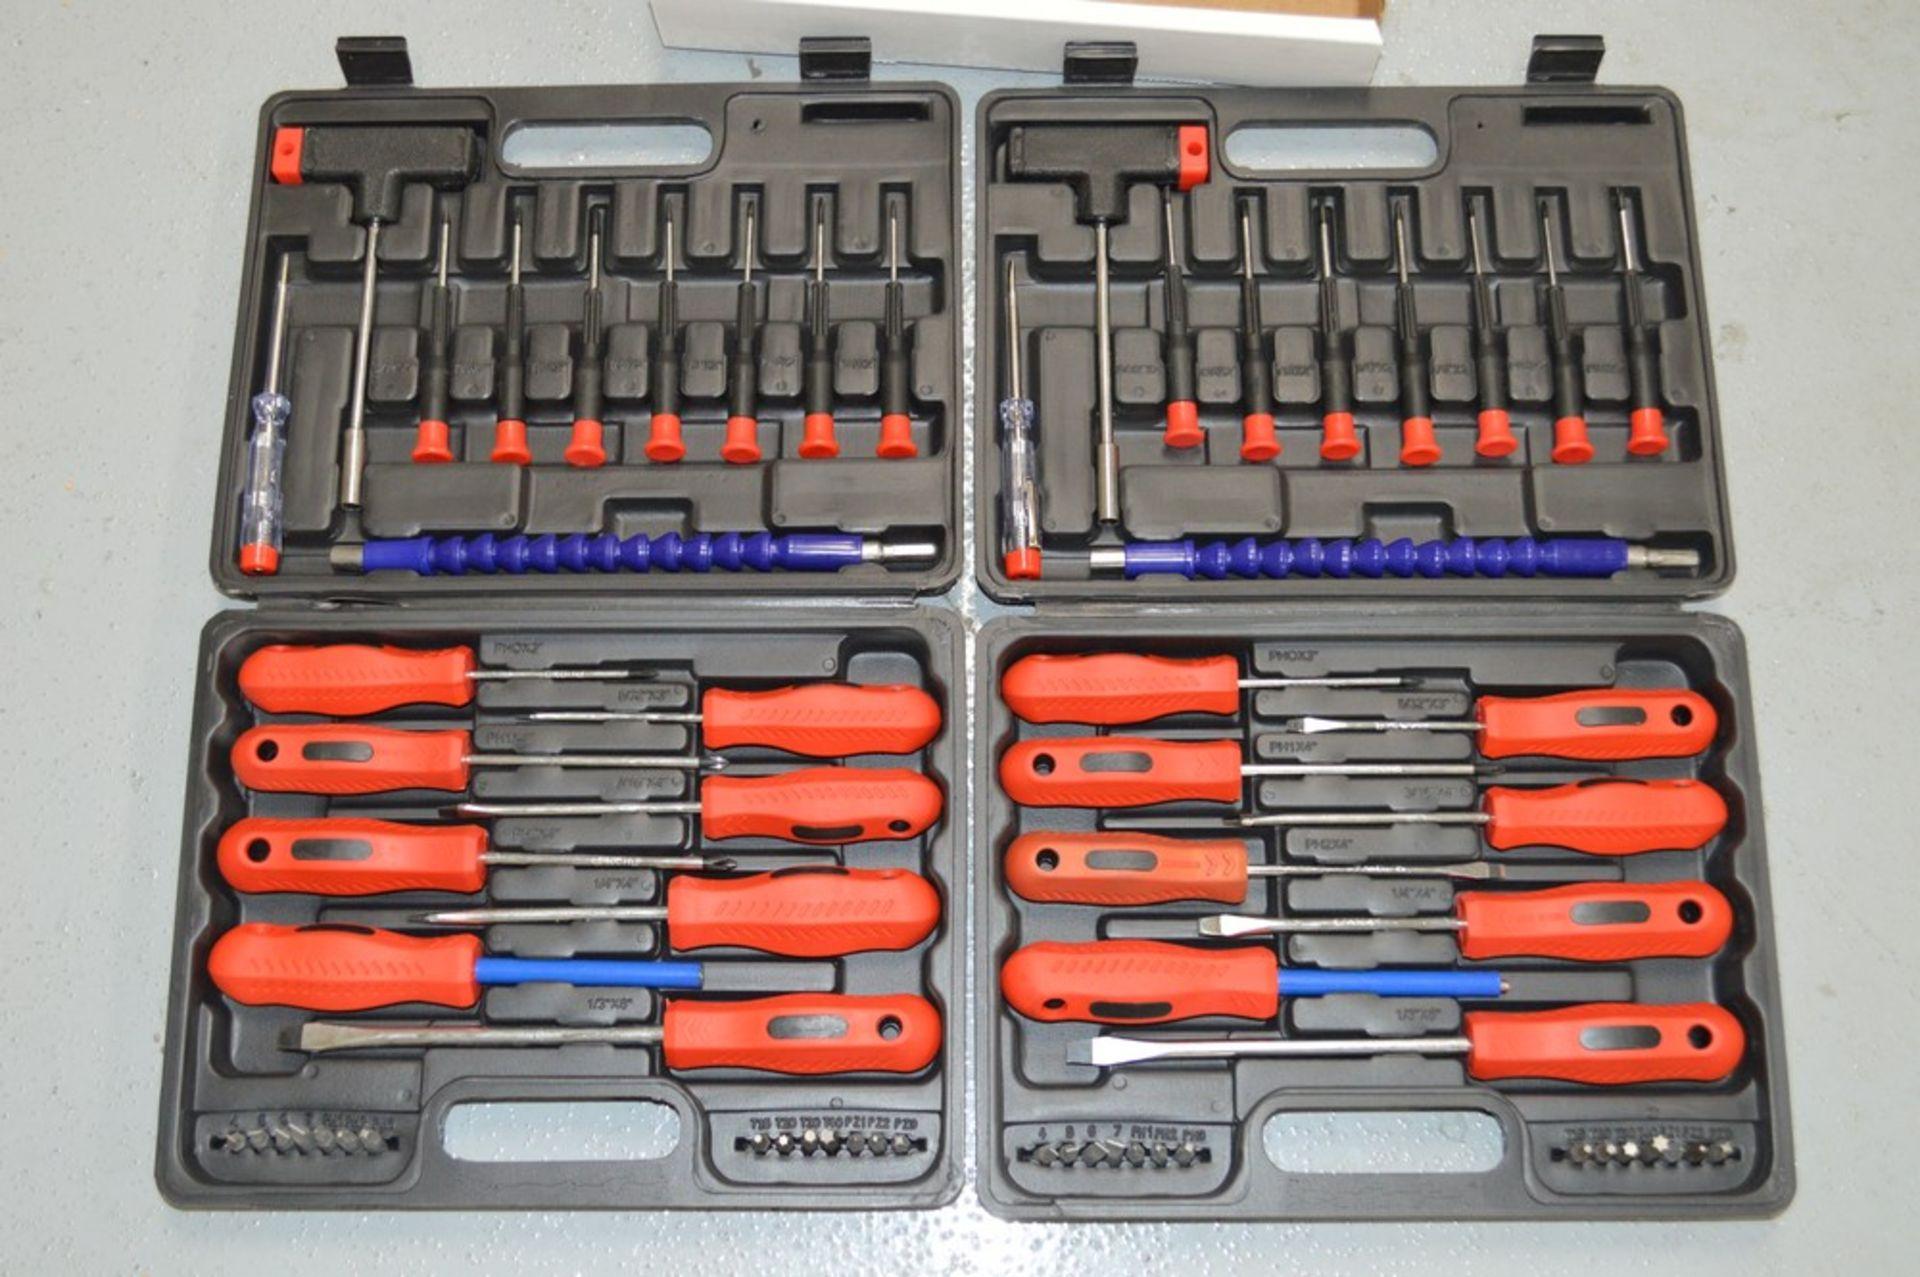 (2) screwdriver sets in hard plastic cases - Image 2 of 2